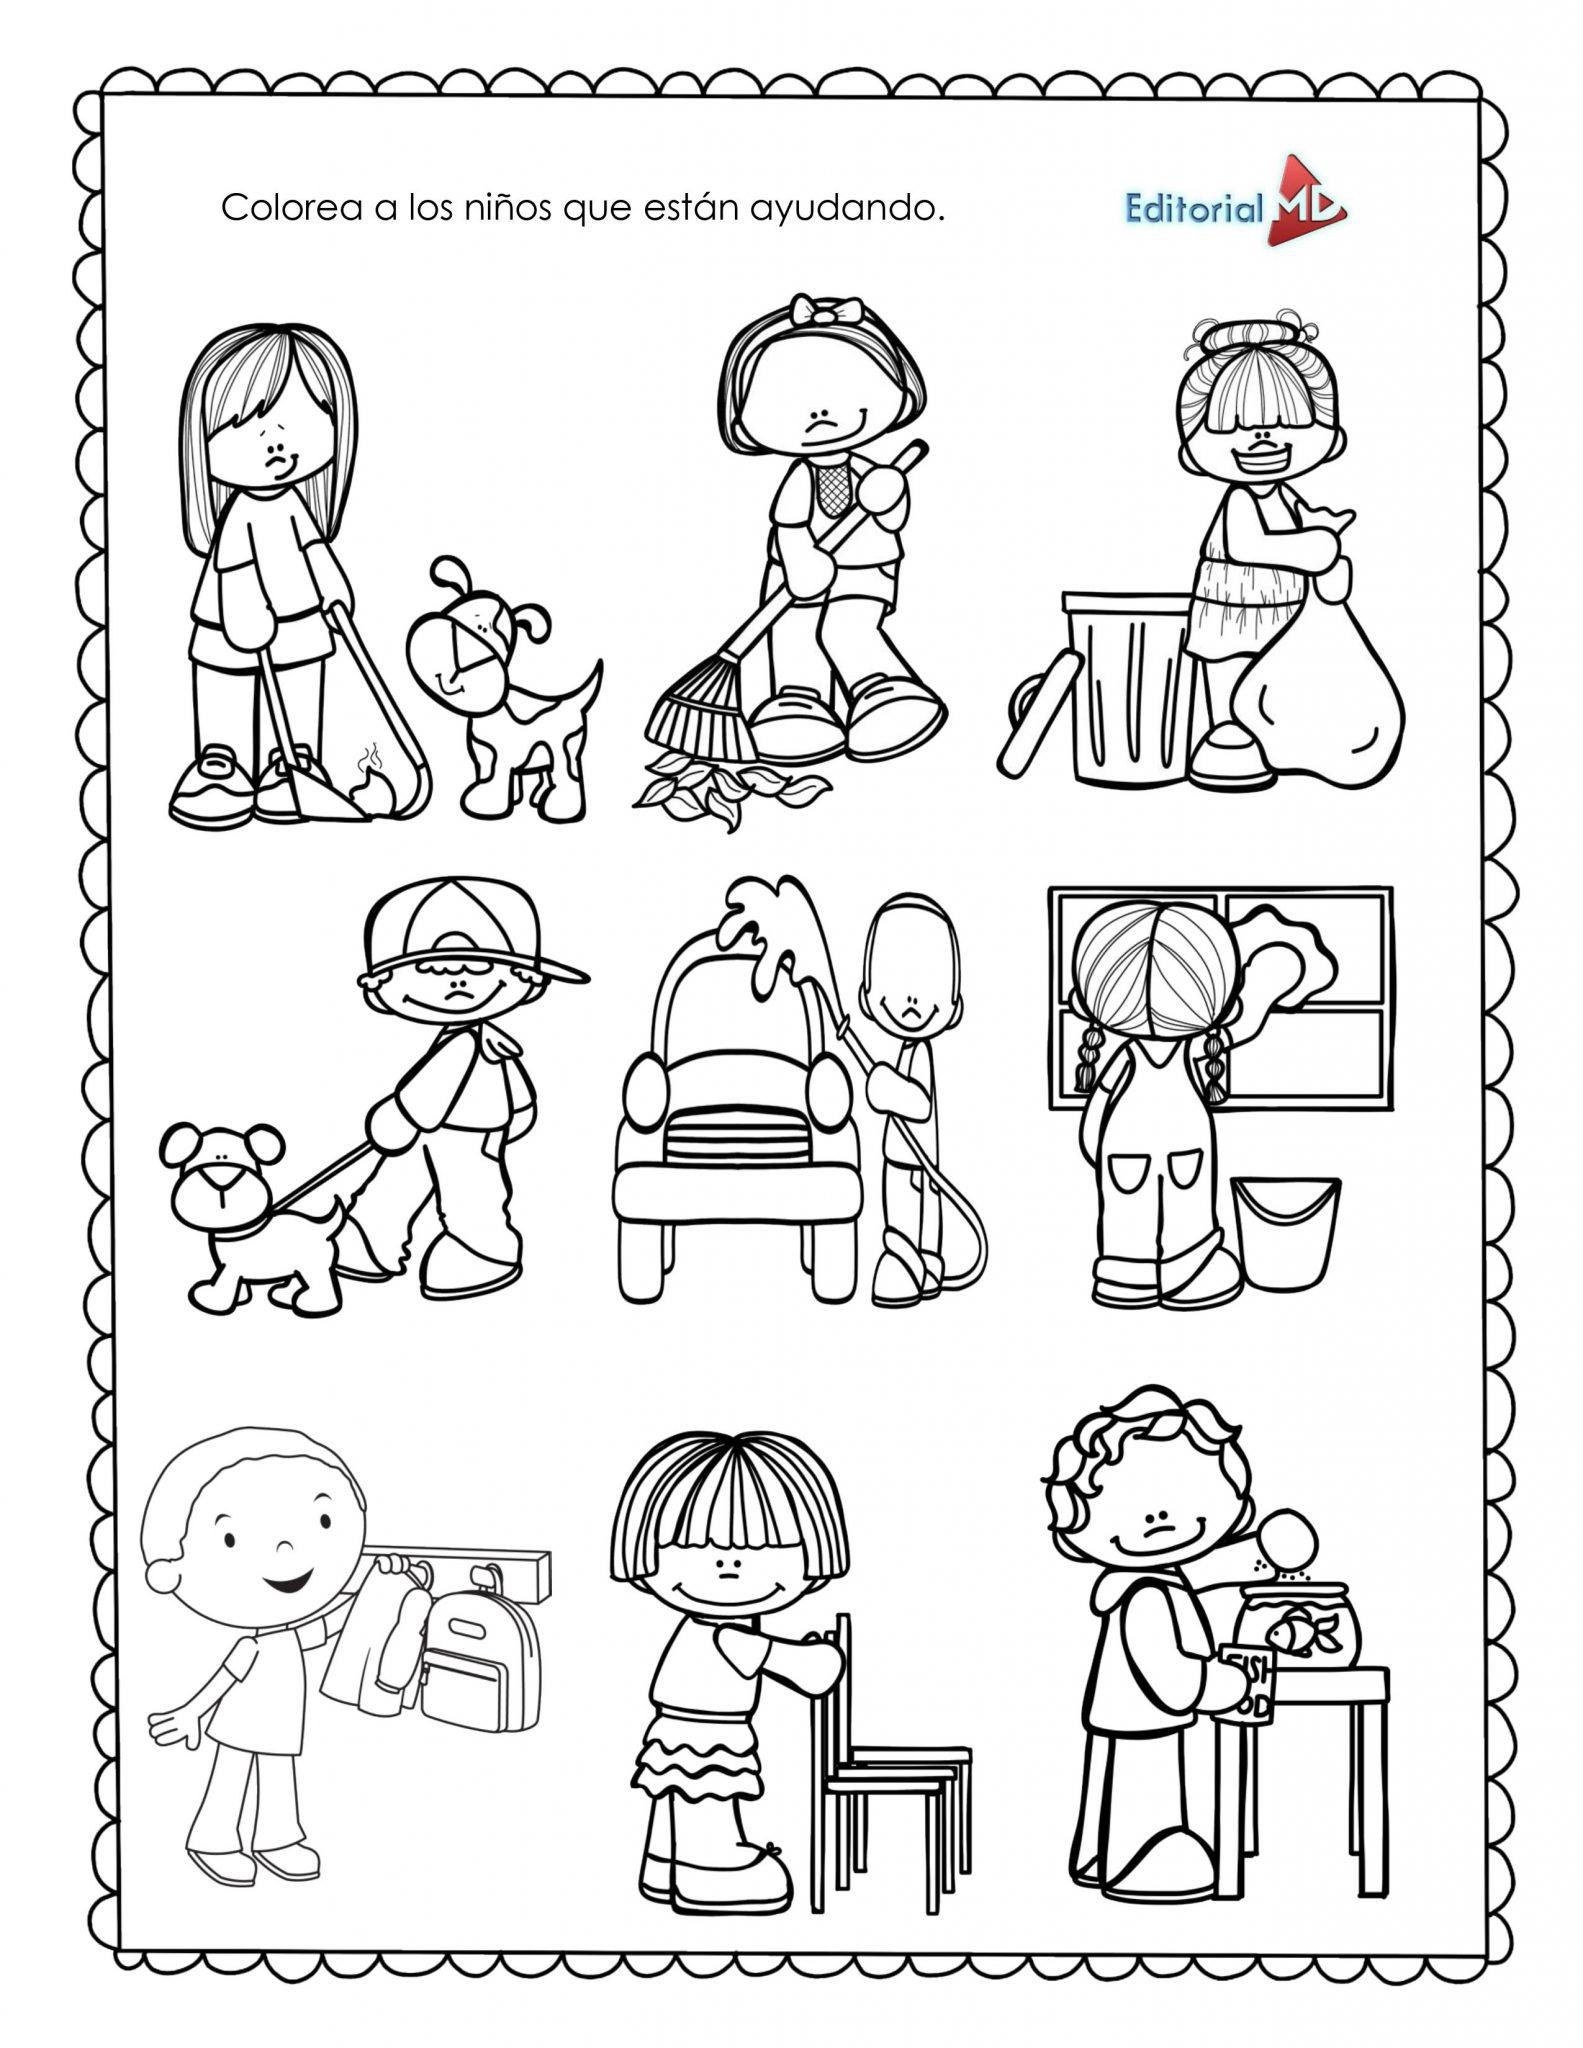 Ejemplo Material de apoyo para imprimir semana 33 preescolar